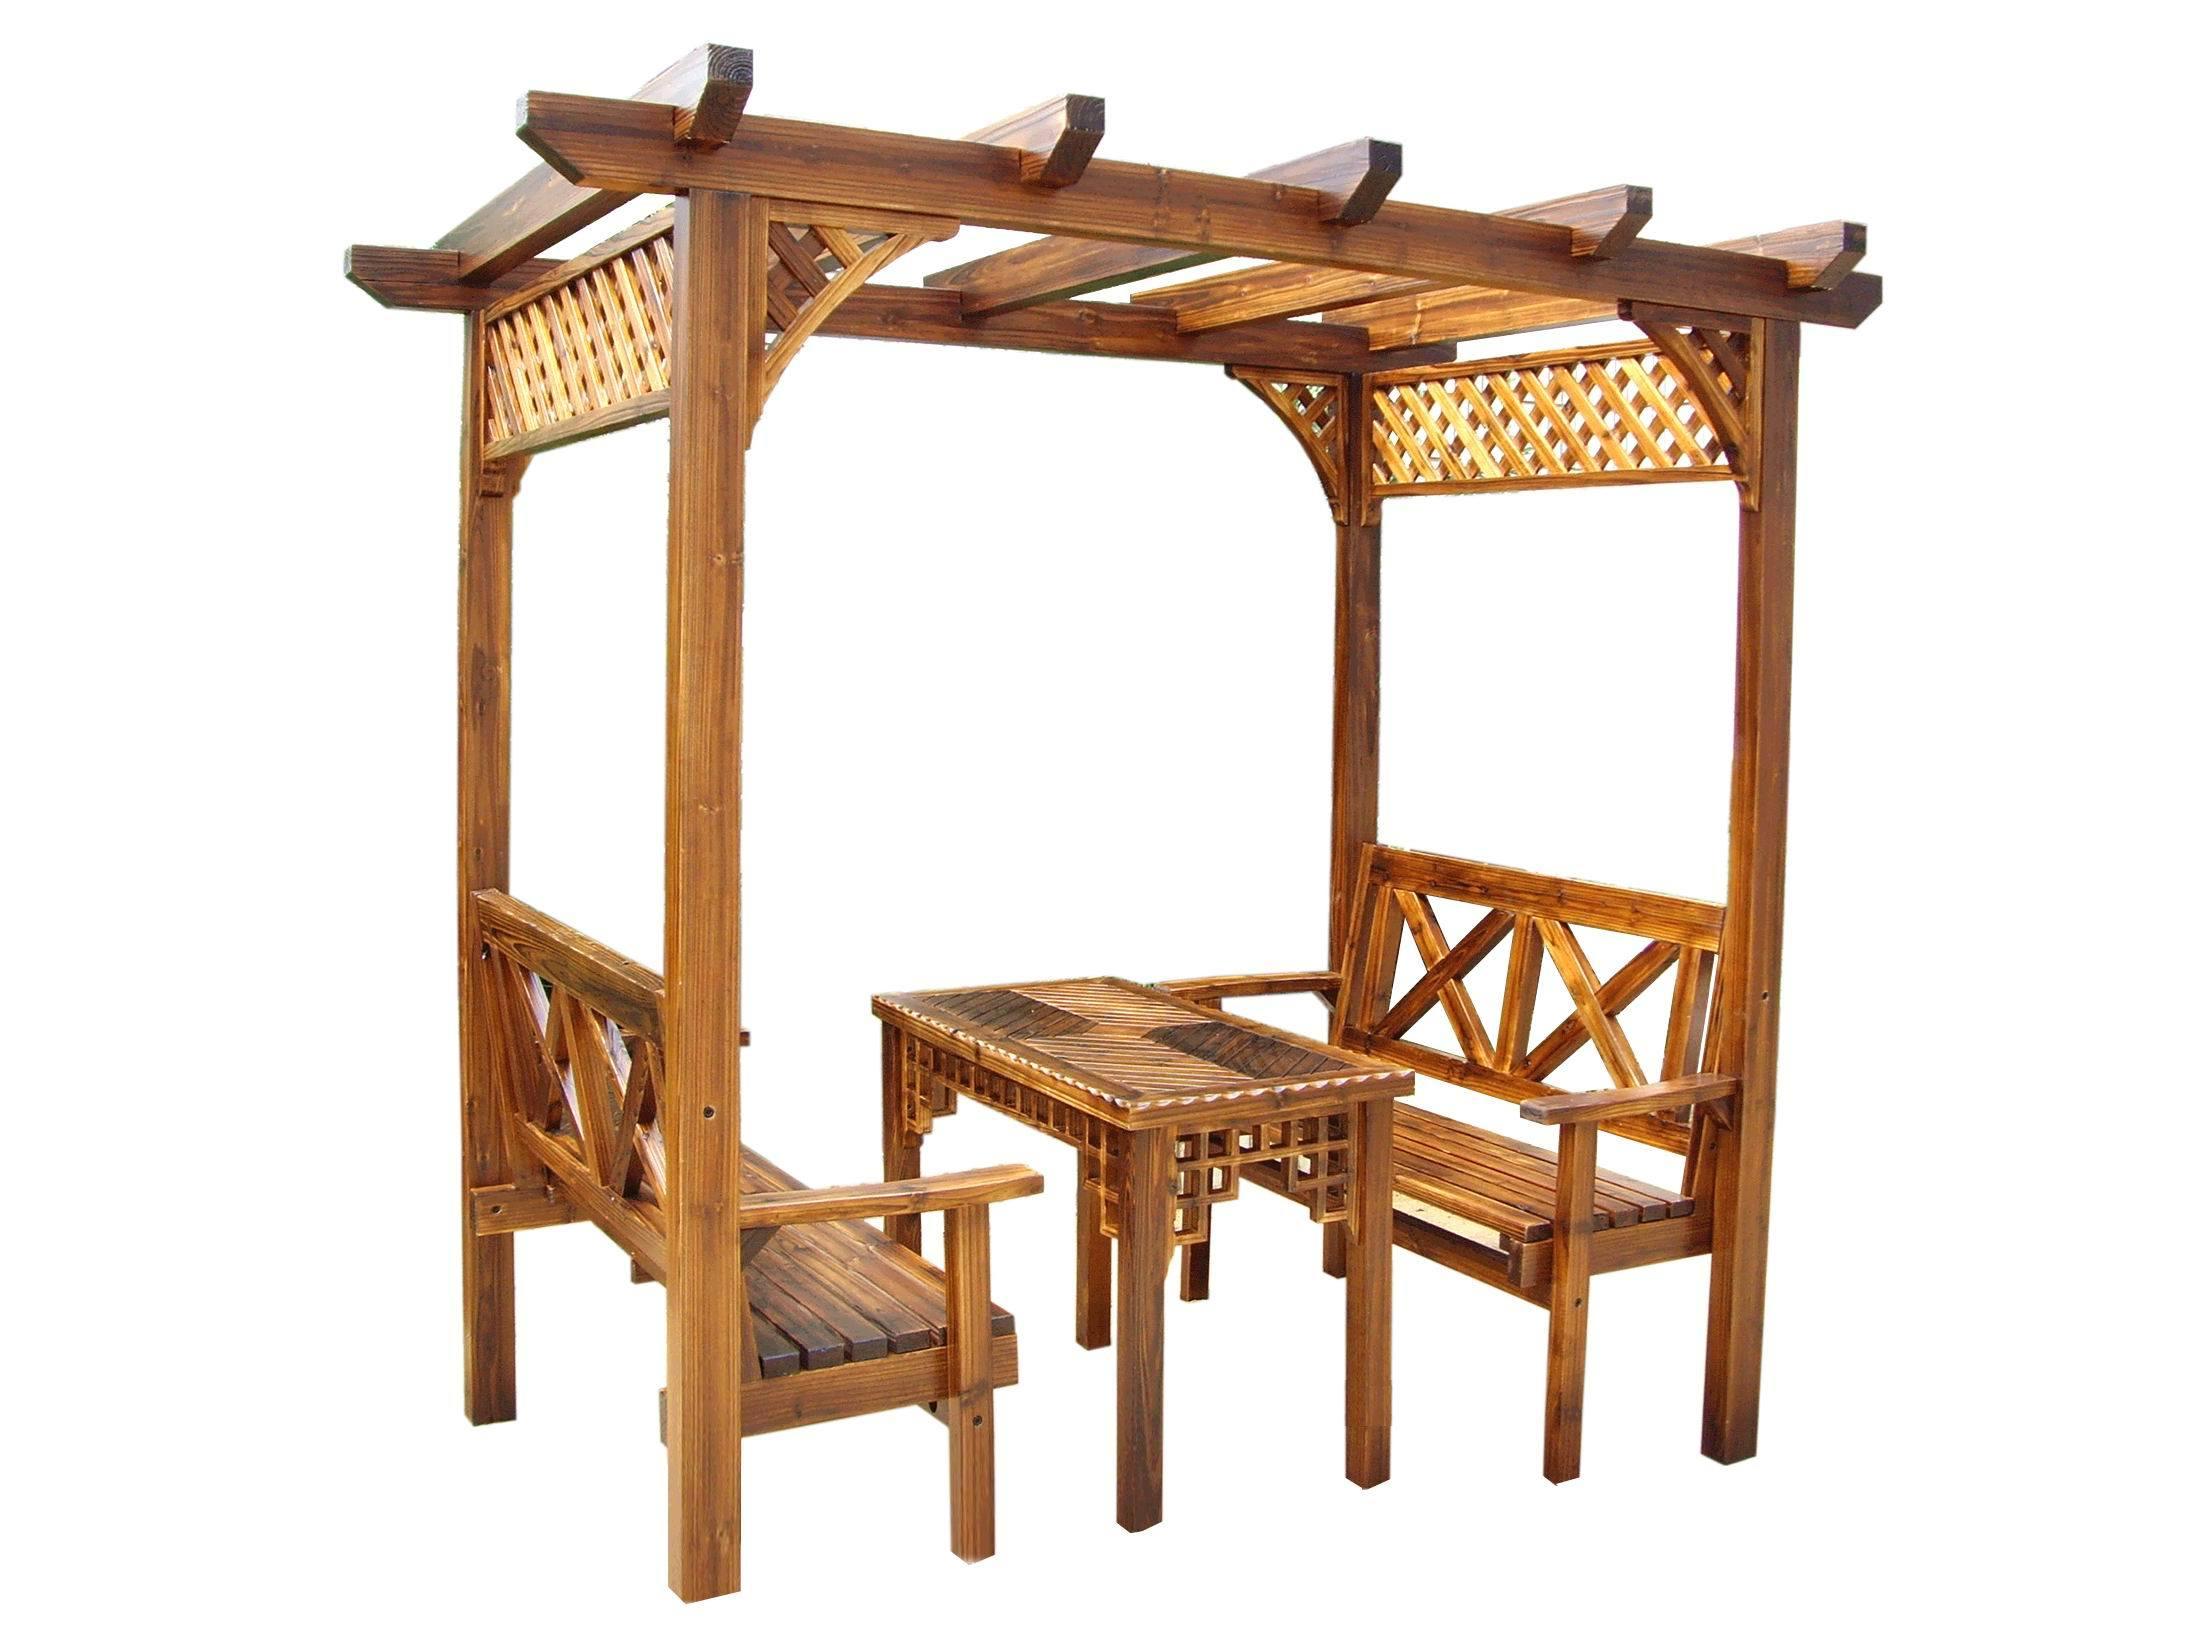 Gazebo de /Wooden del pabellón/muebles al aire libre (SC ...